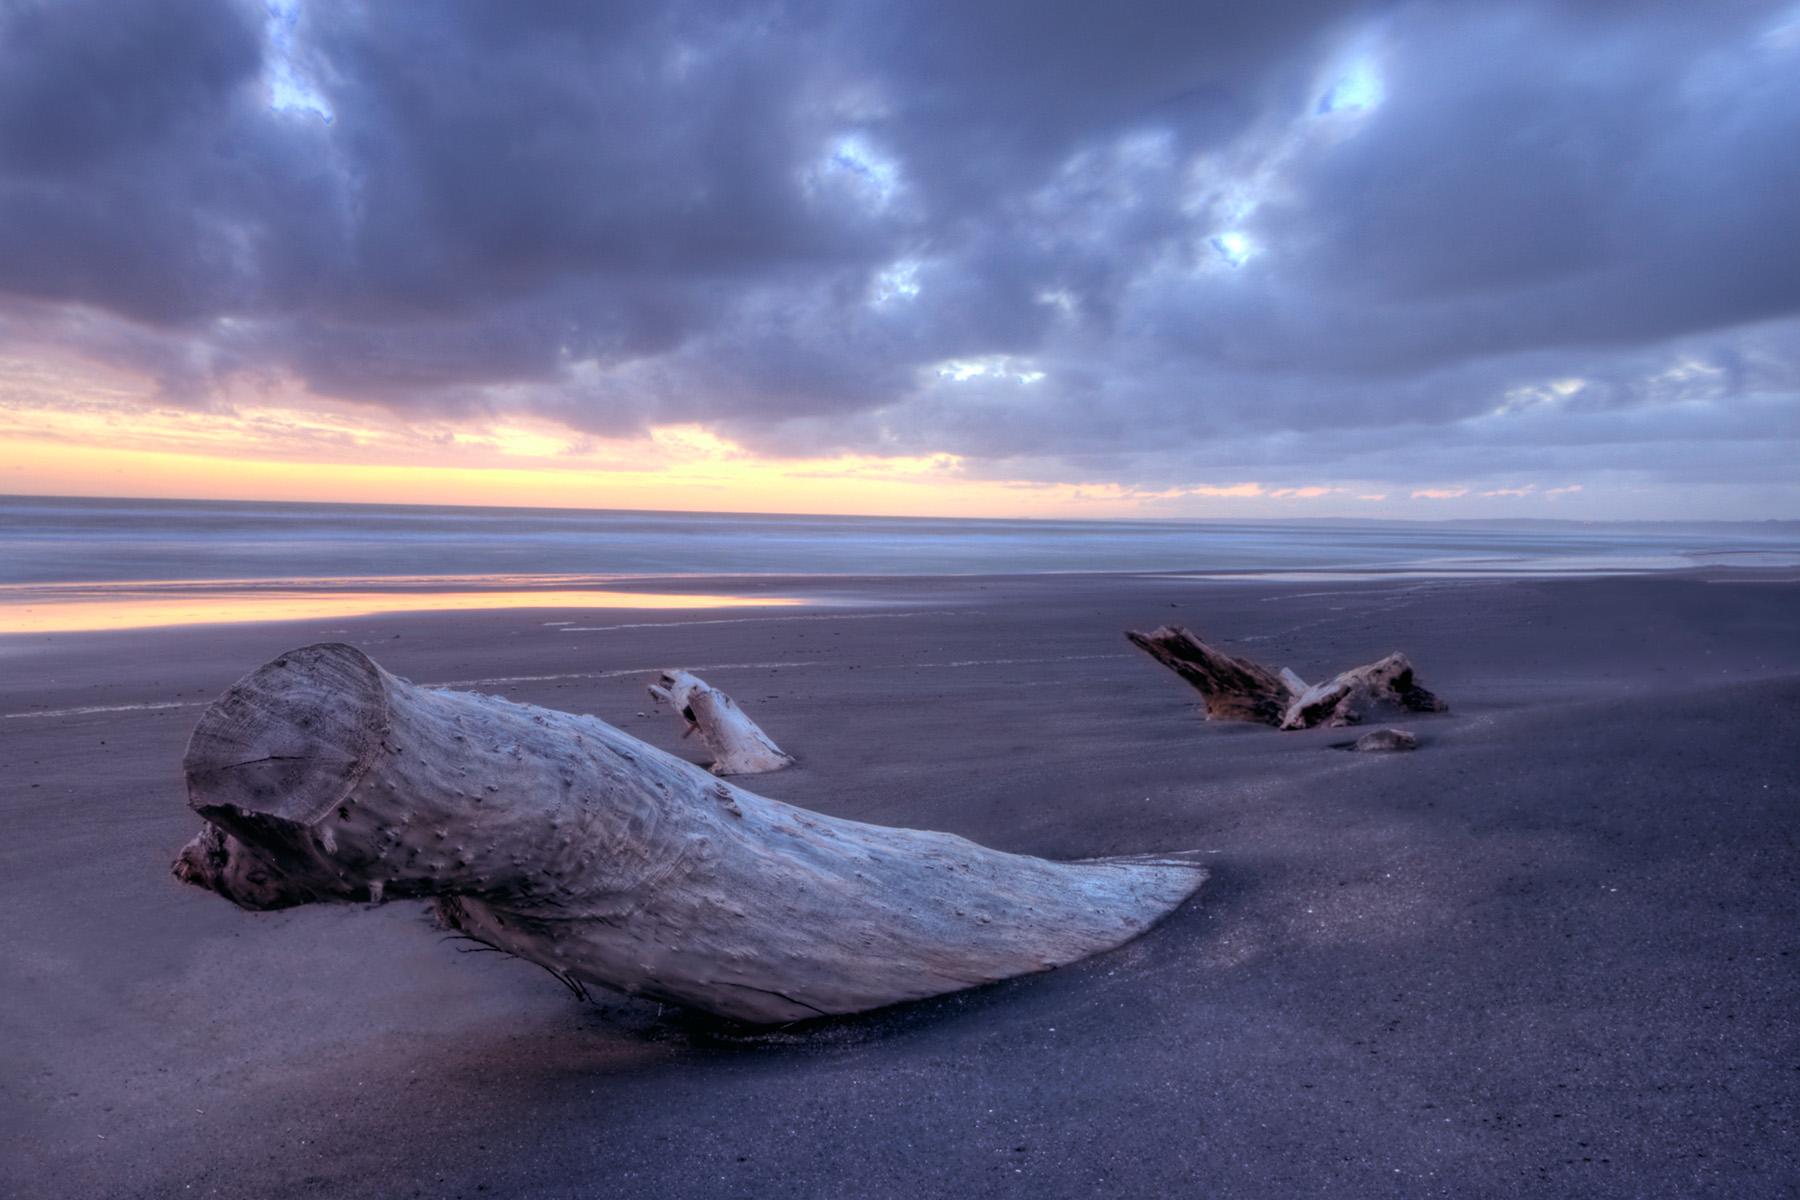 deserted_beach